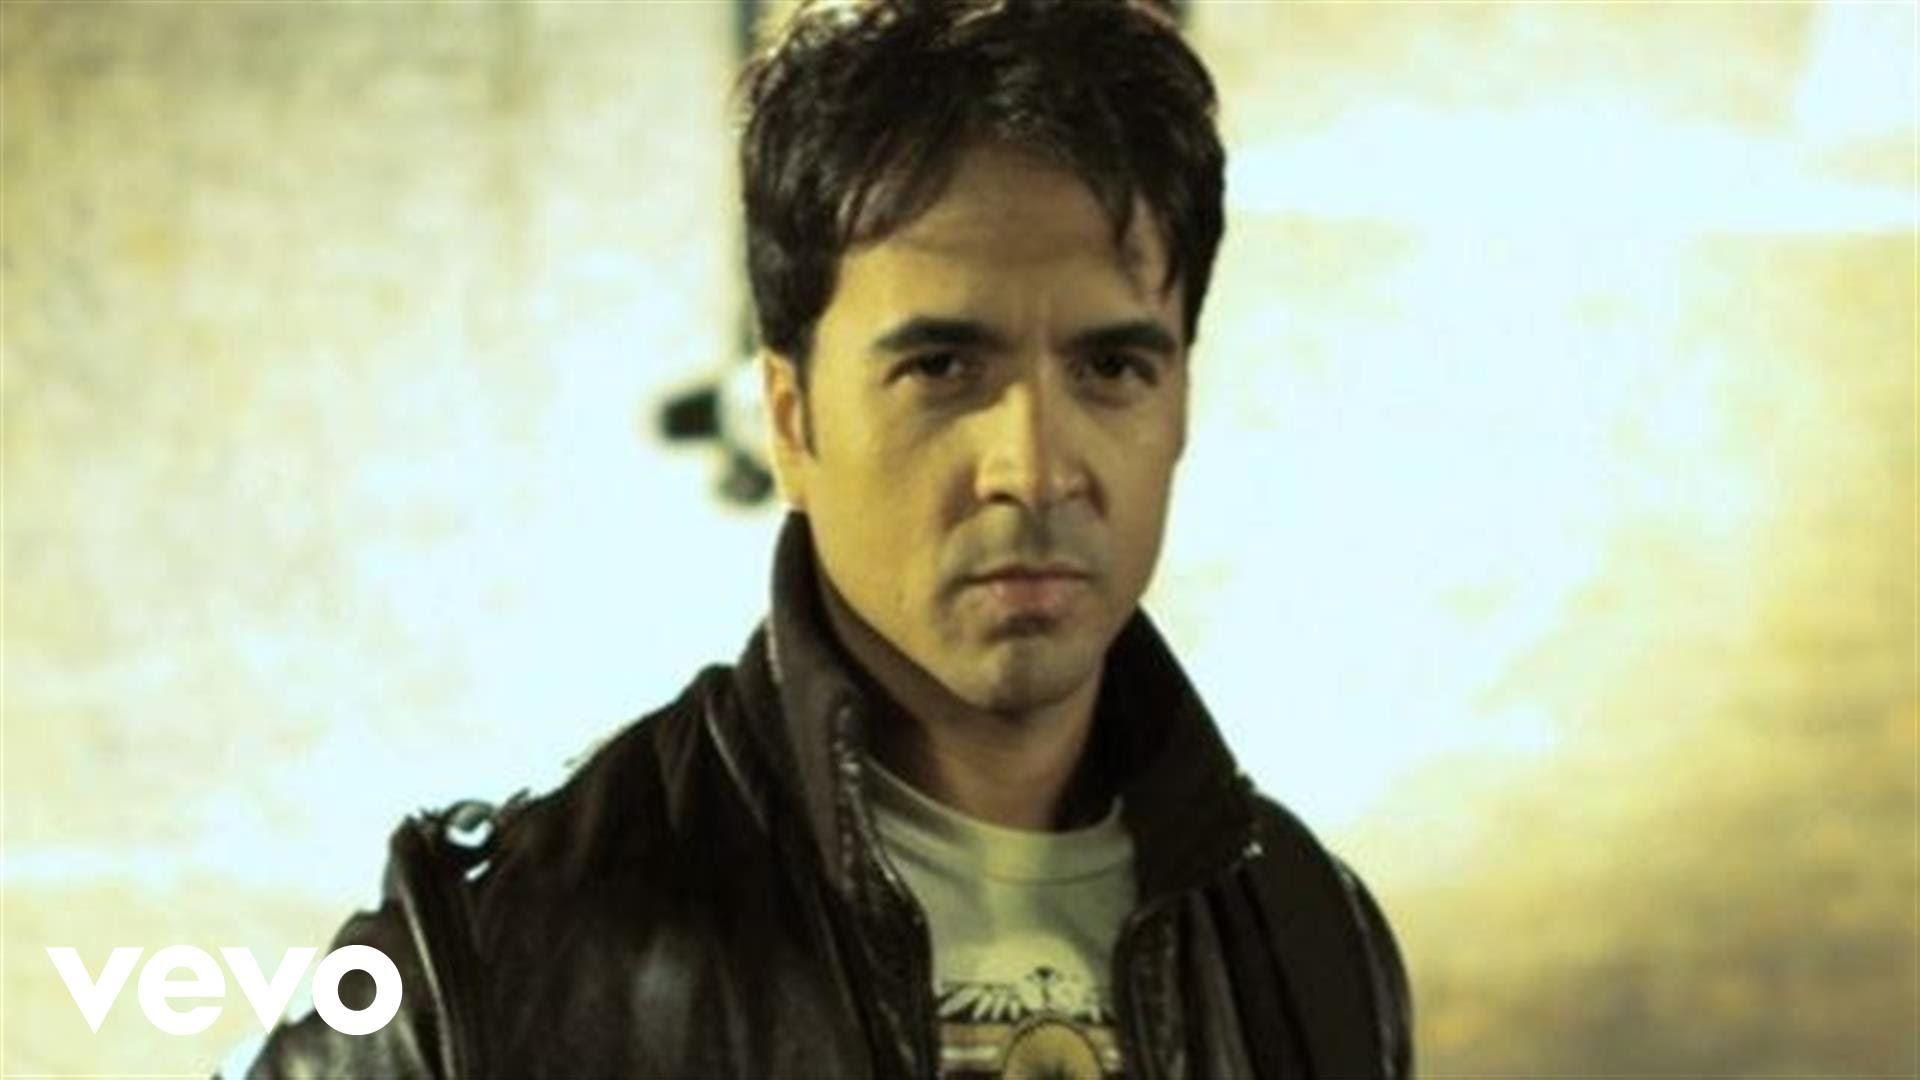 Luis Fonsi Gritar Music Is My Escape Singer Music Videos